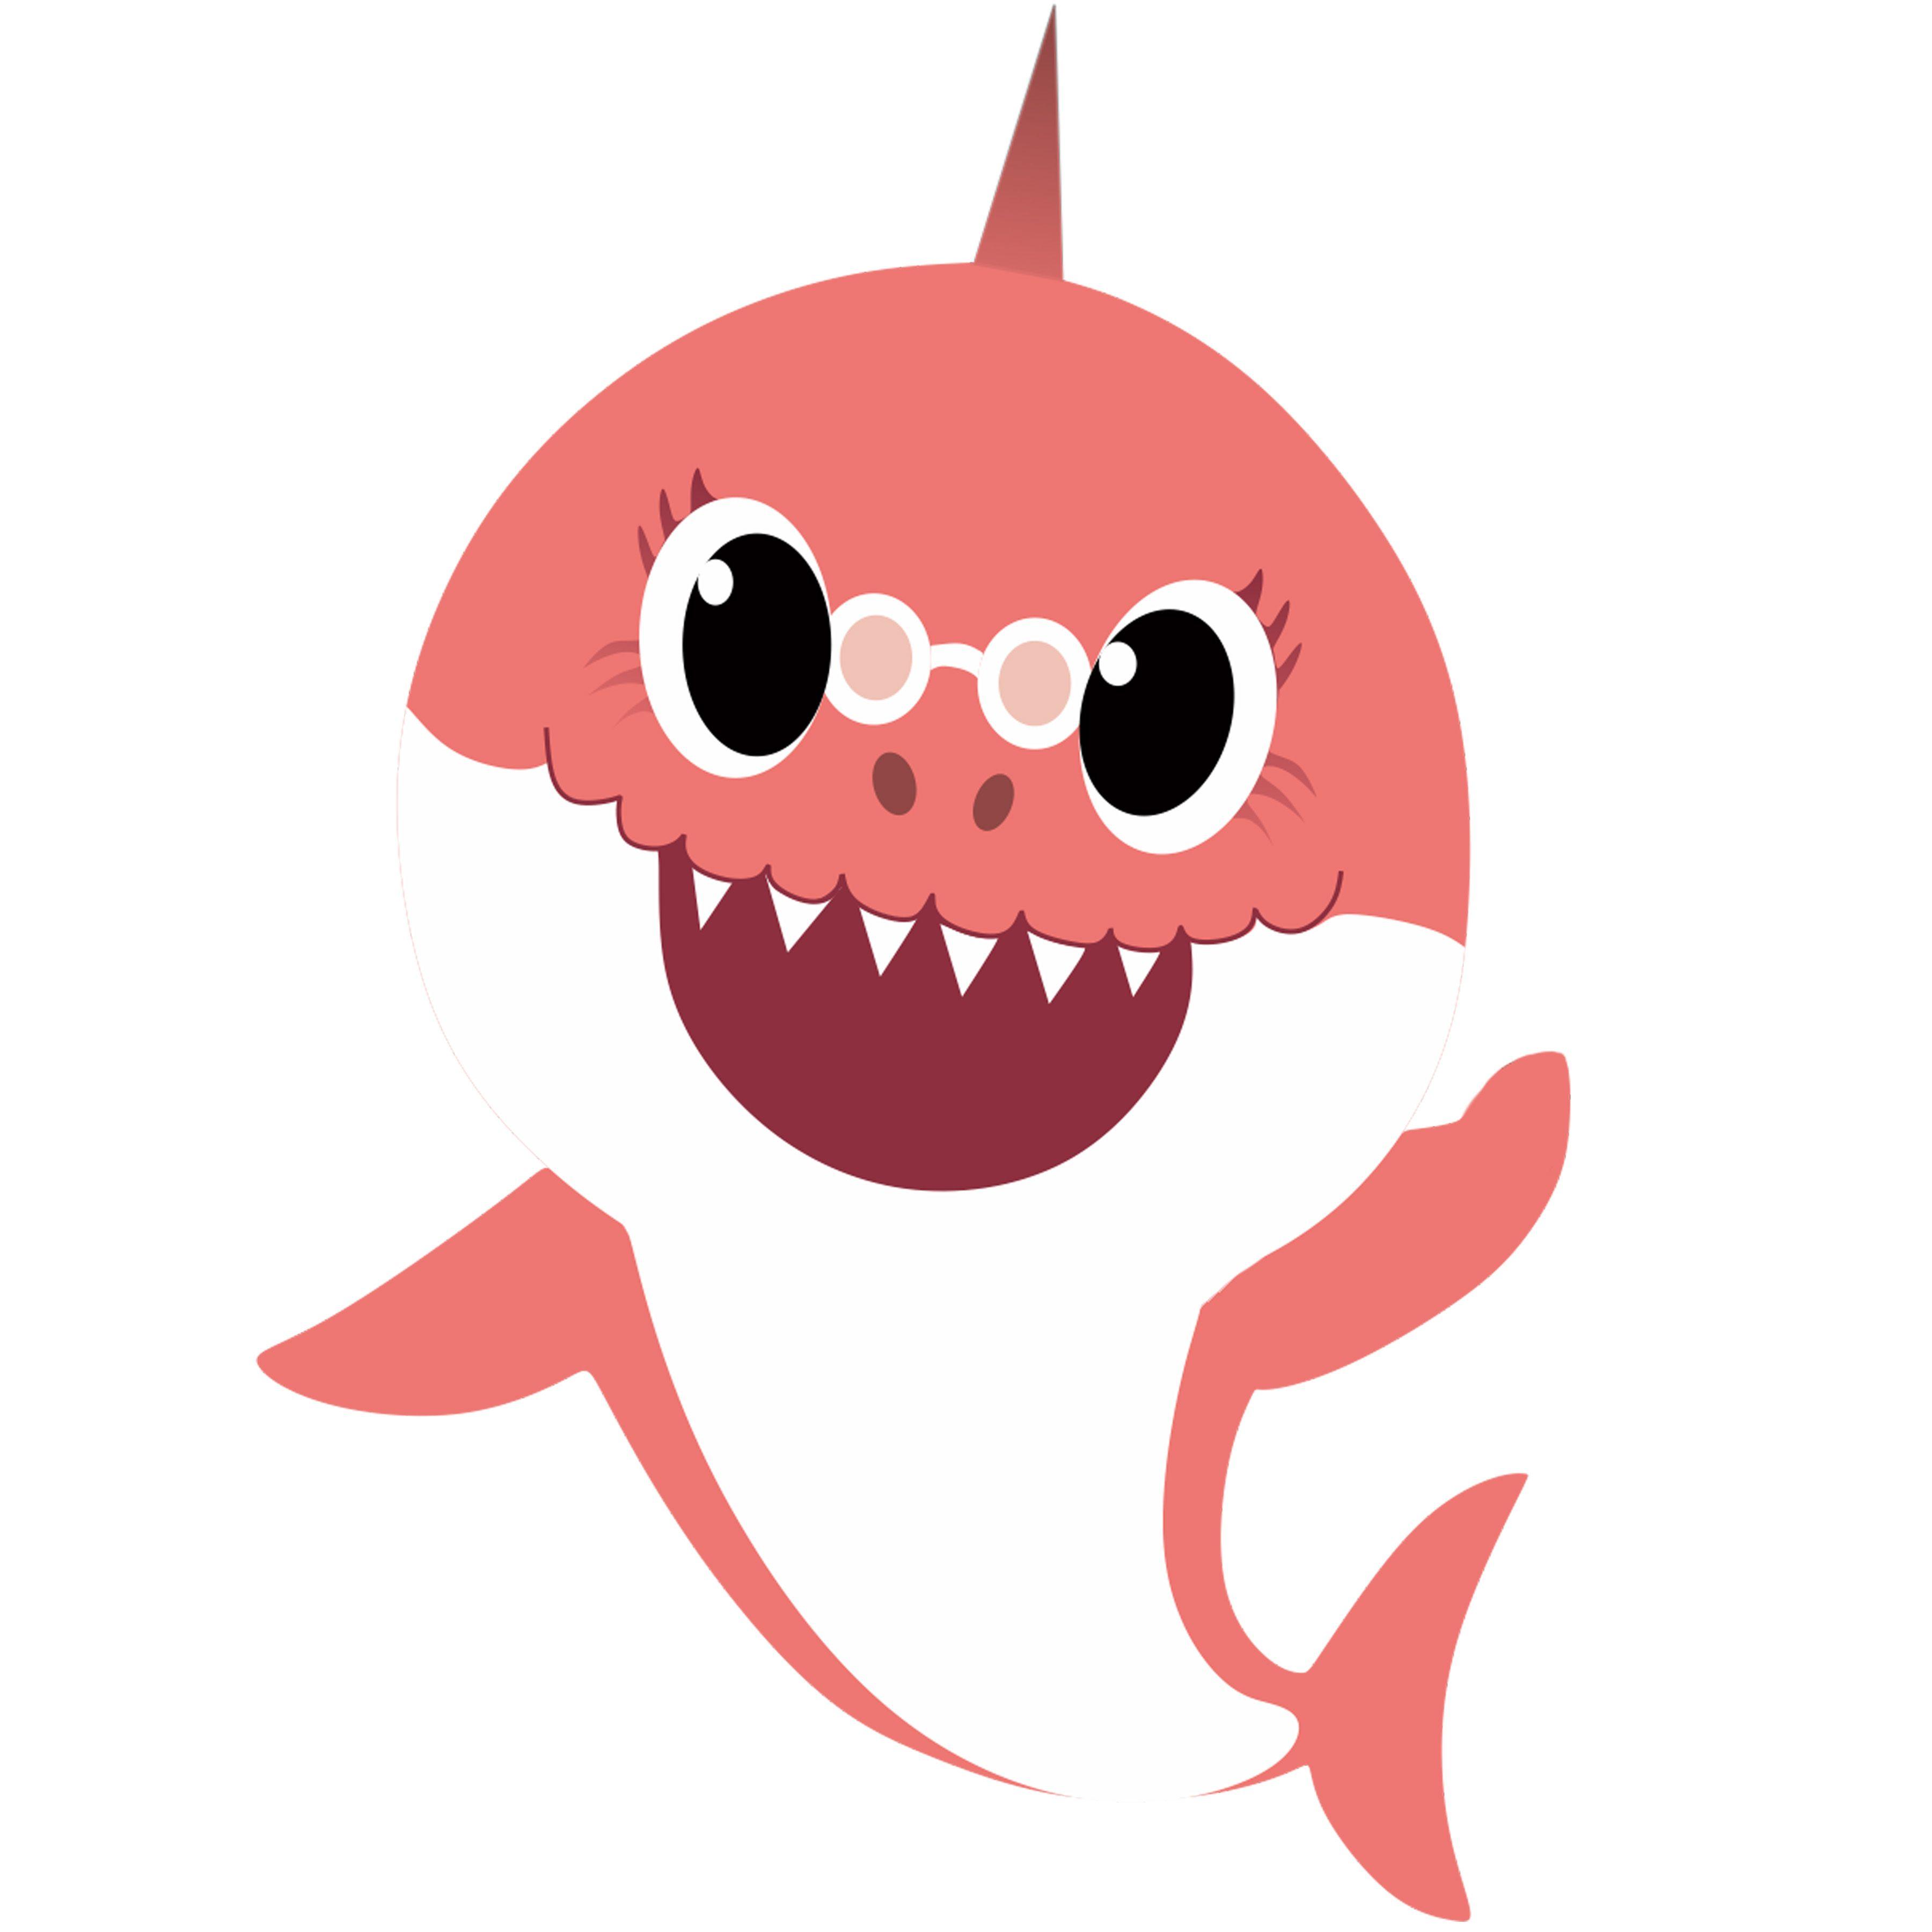 #babyshark #sharkfamily #mommyshark #daddyshark Baby